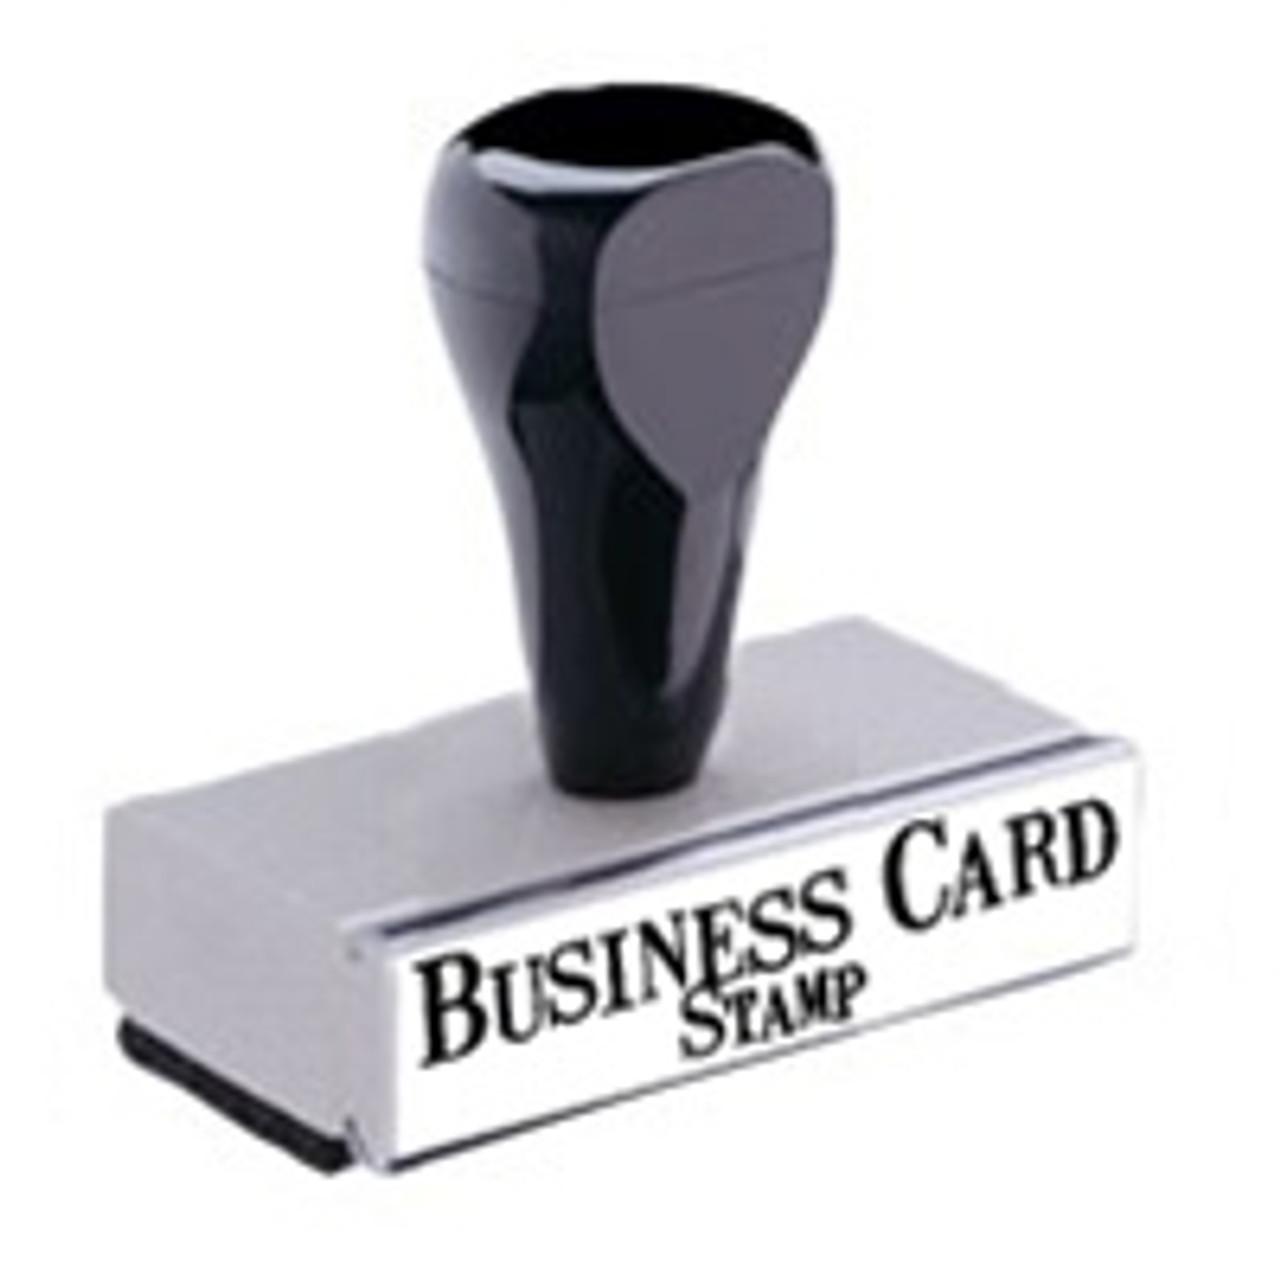 Custom Business card Stamp knob handle